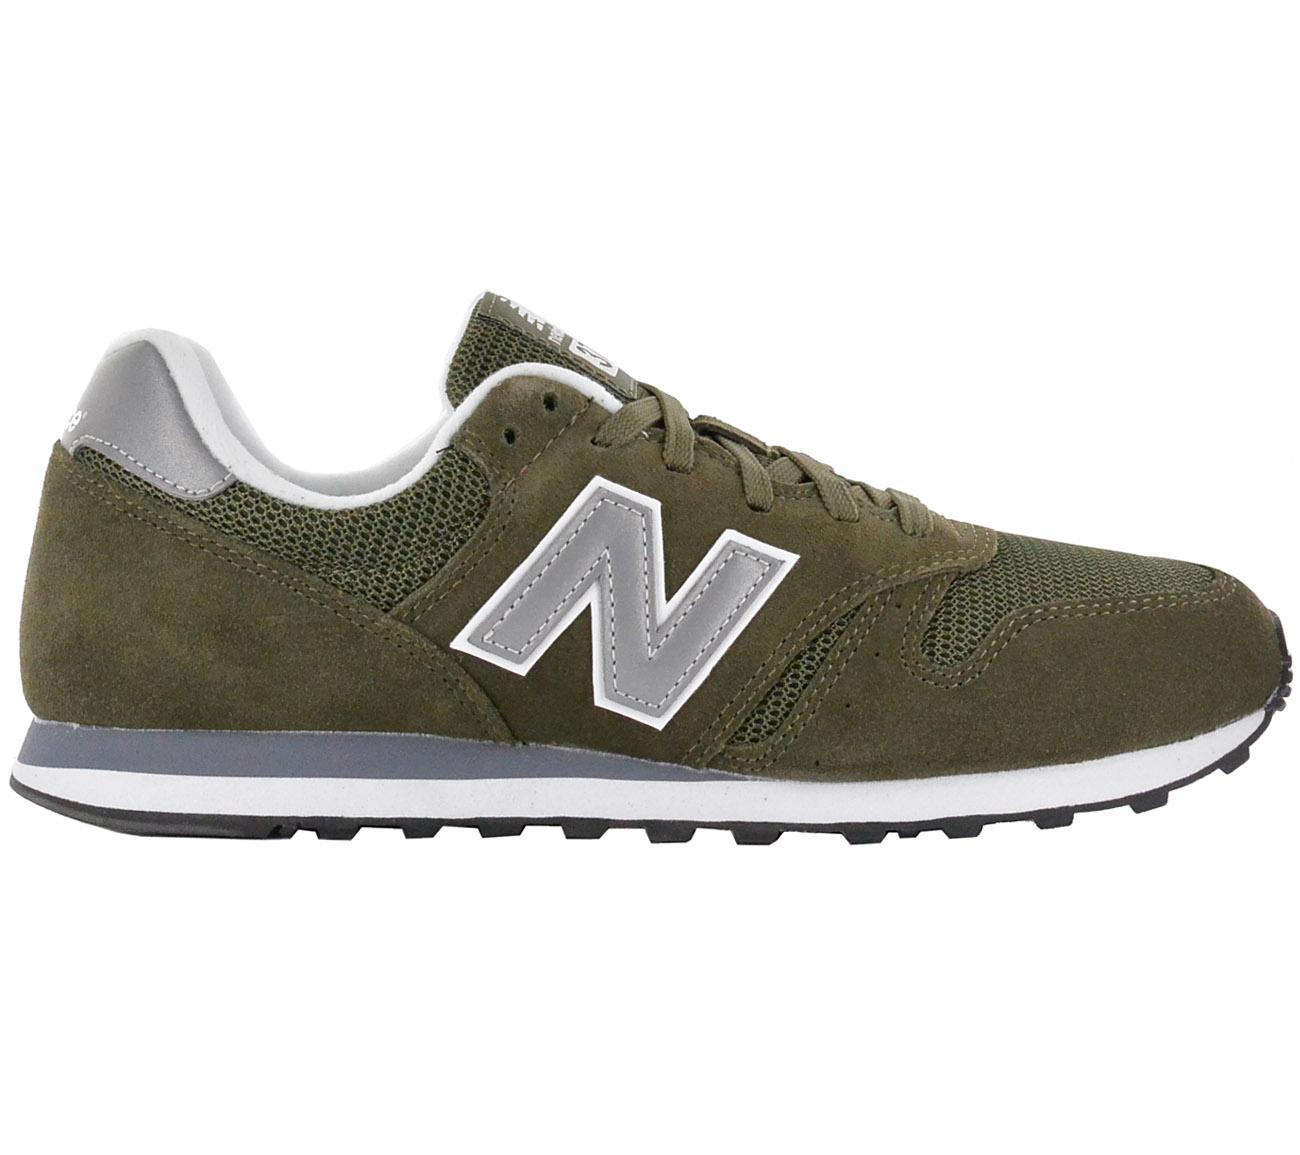 24b48e45e2f25 New Balance Classics Sneaker 373 Ml373olv Men's Shoes Olive Green ...